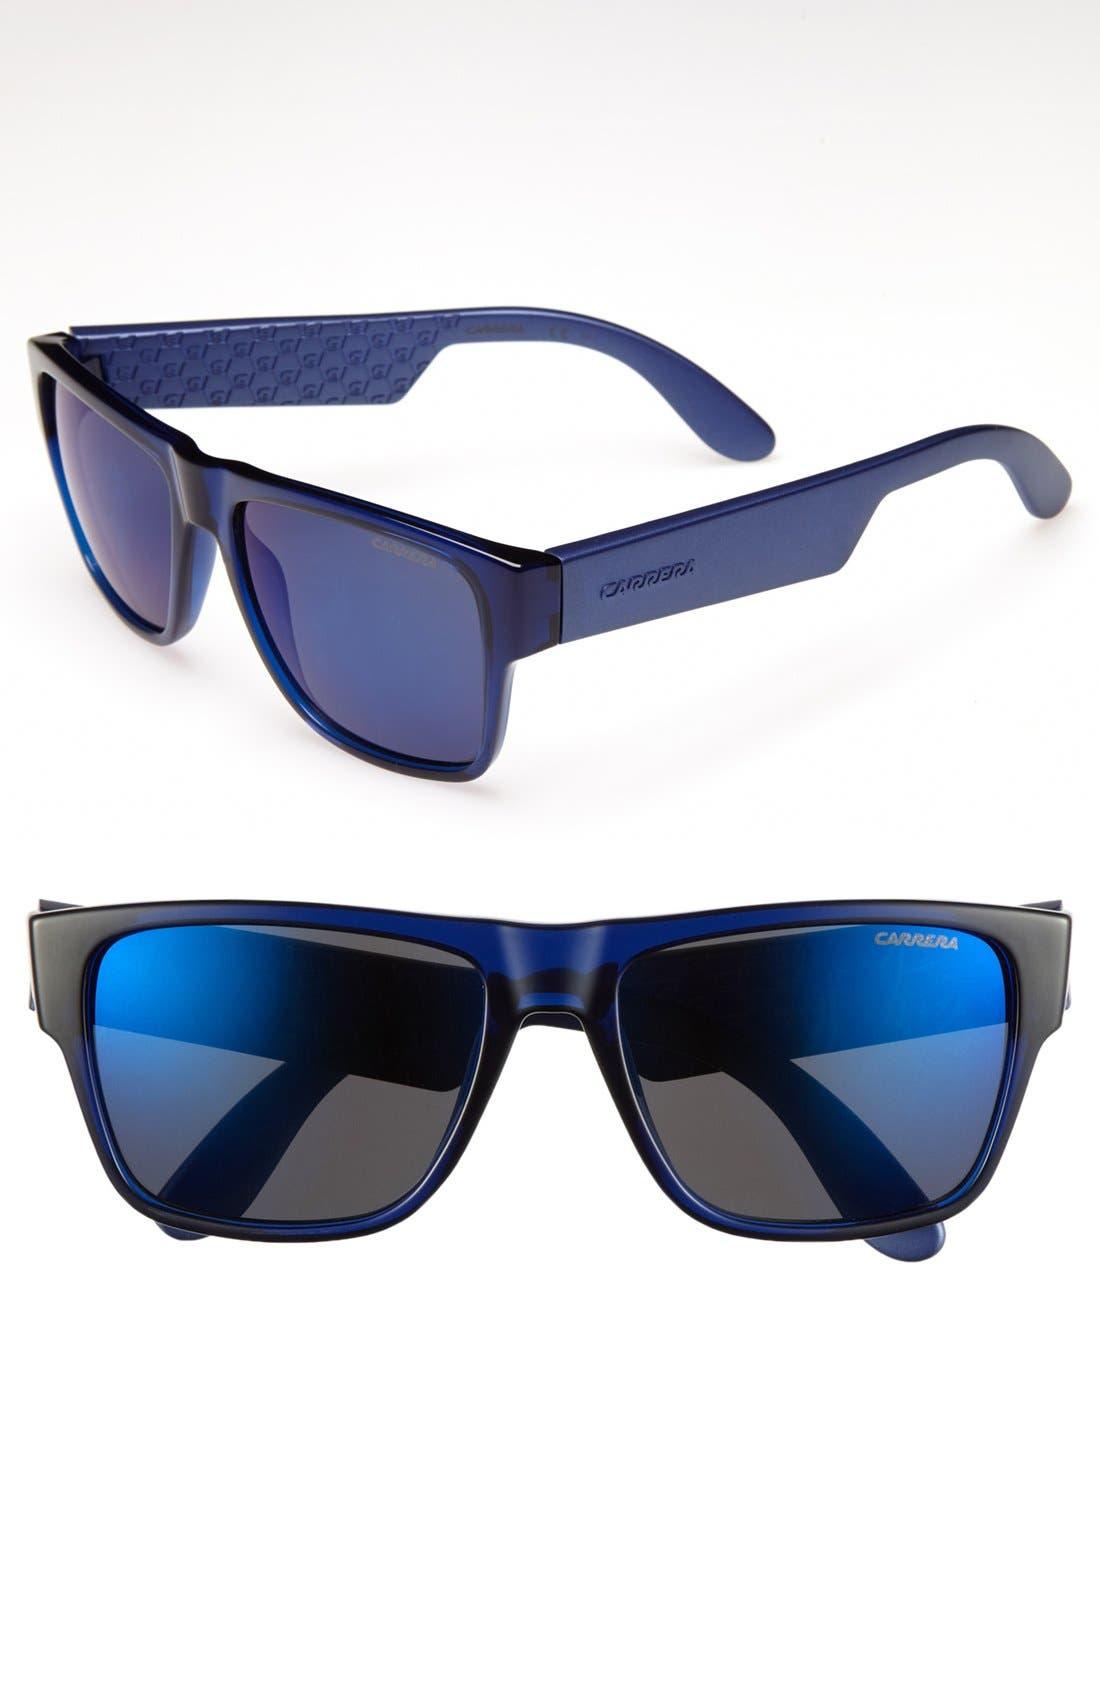 Main Image - Carrera Eyewear '5002' 55mm Sunglasses